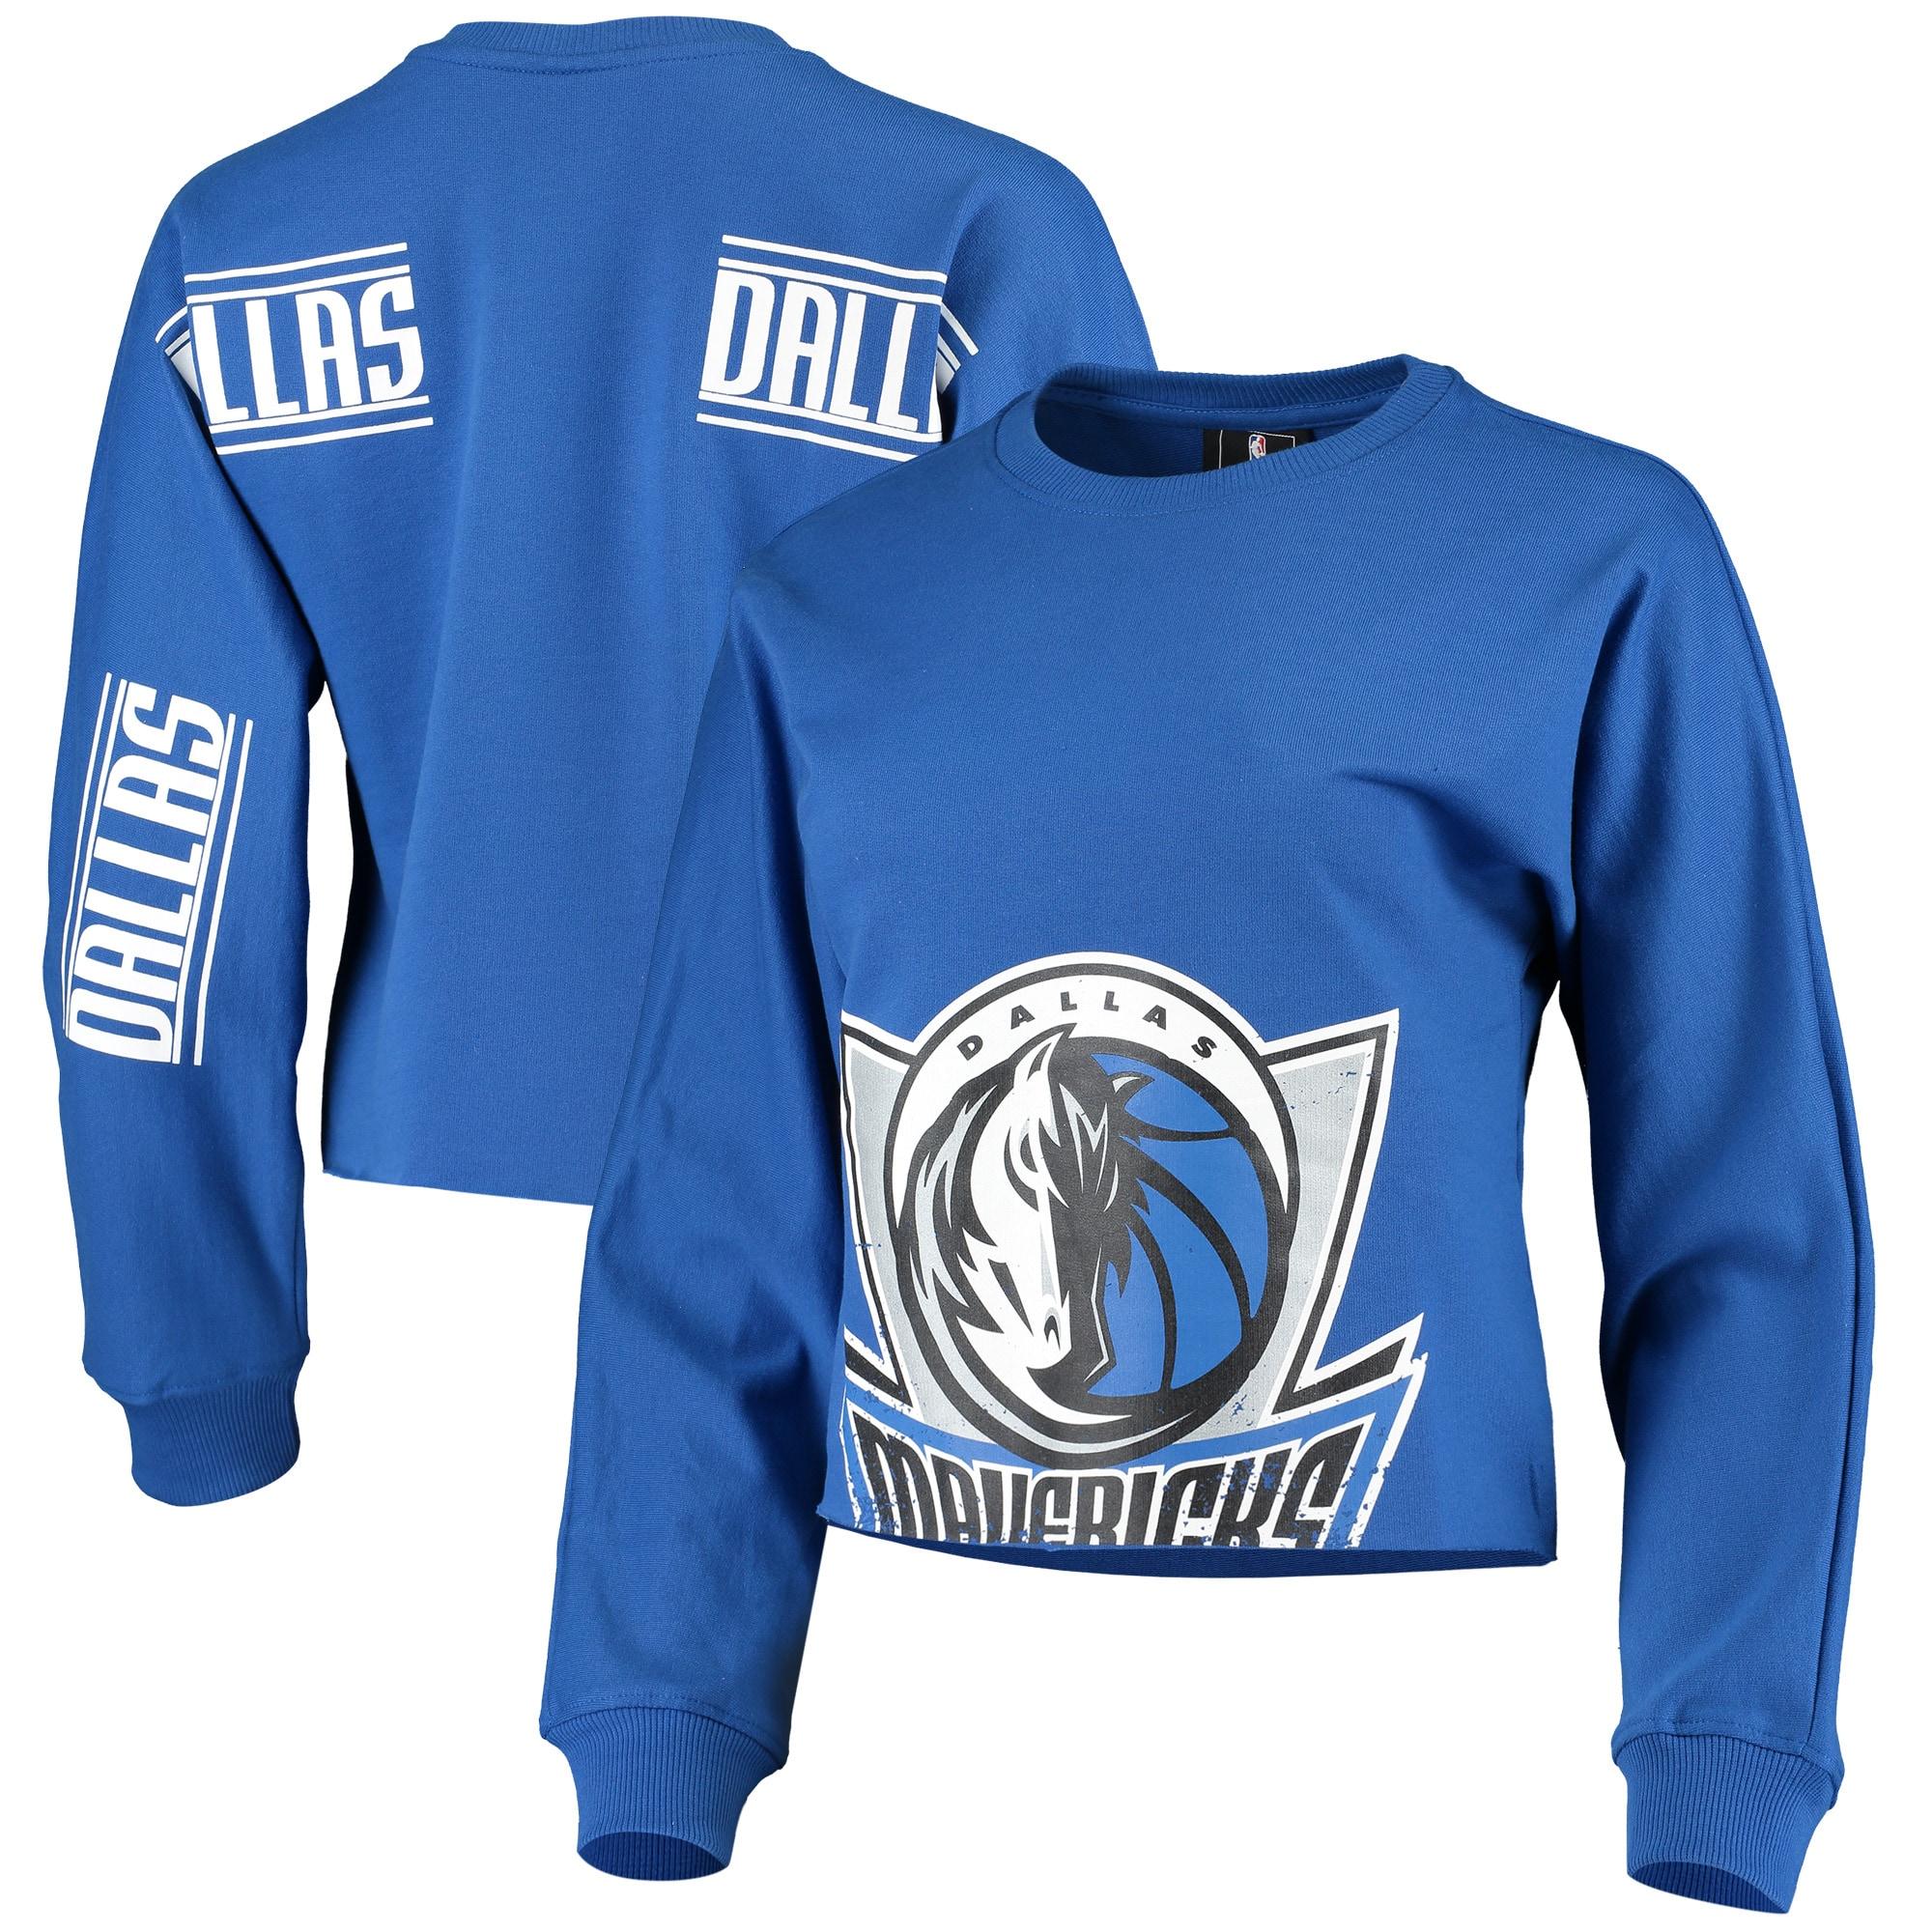 Dallas Mavericks Women's Cropped Long Sleeve T-Shirt - Blue